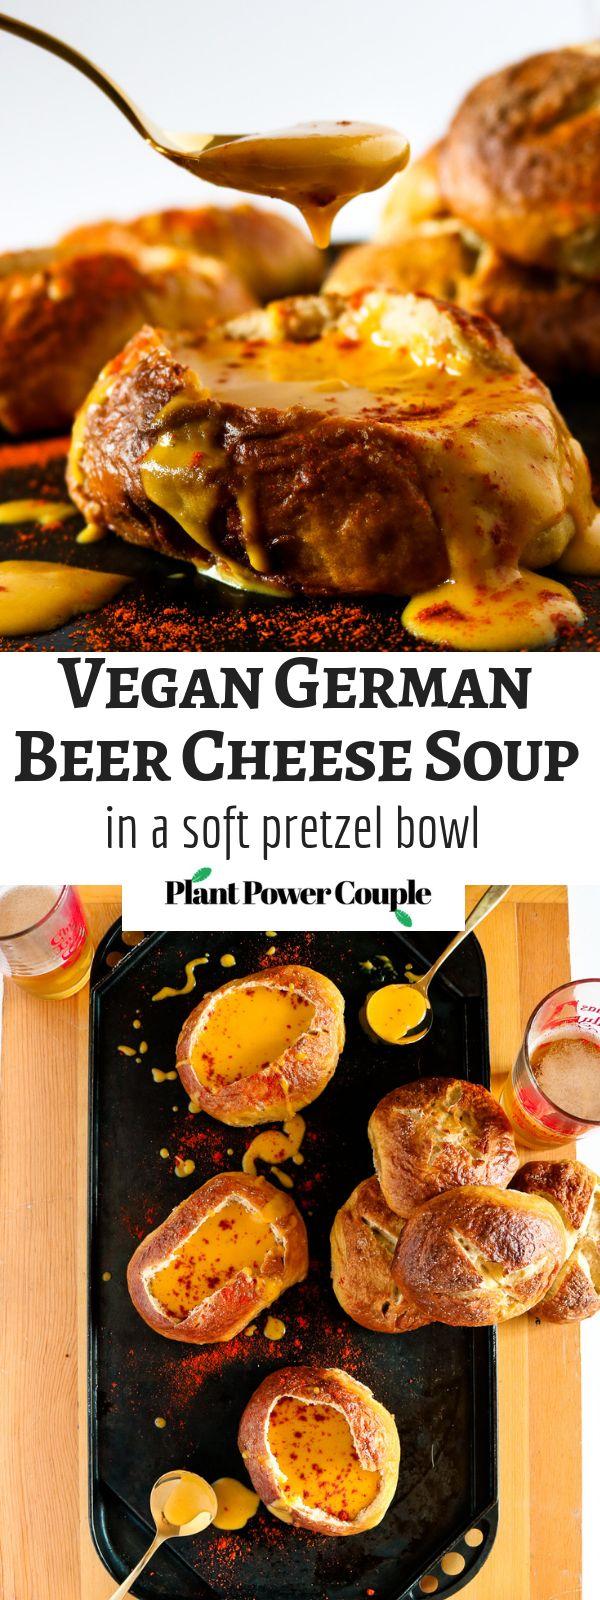 Vegan German Beer Cheese Soup in a Soft Pretzel Bowl